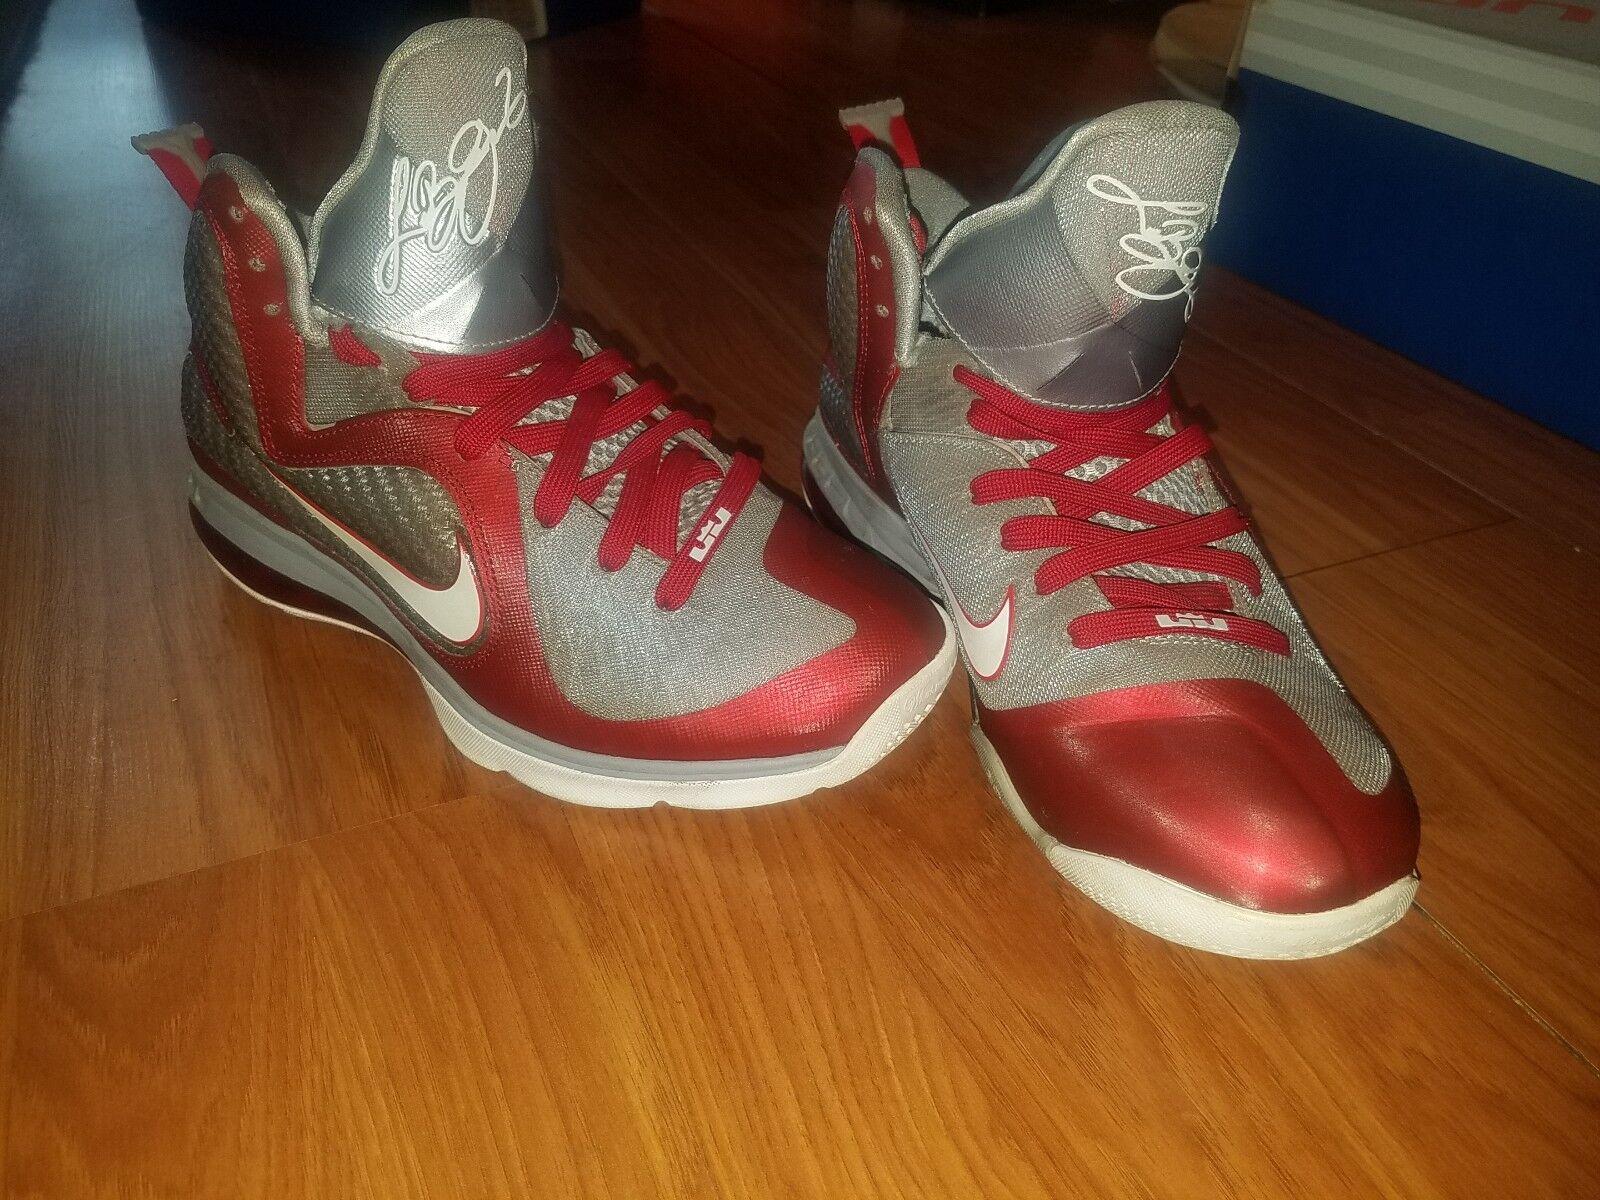 d4cfb75db727 Nike LeBron 9 Ohio State 469764-601 Size Size Size 8 Rare. eeefe4 ...